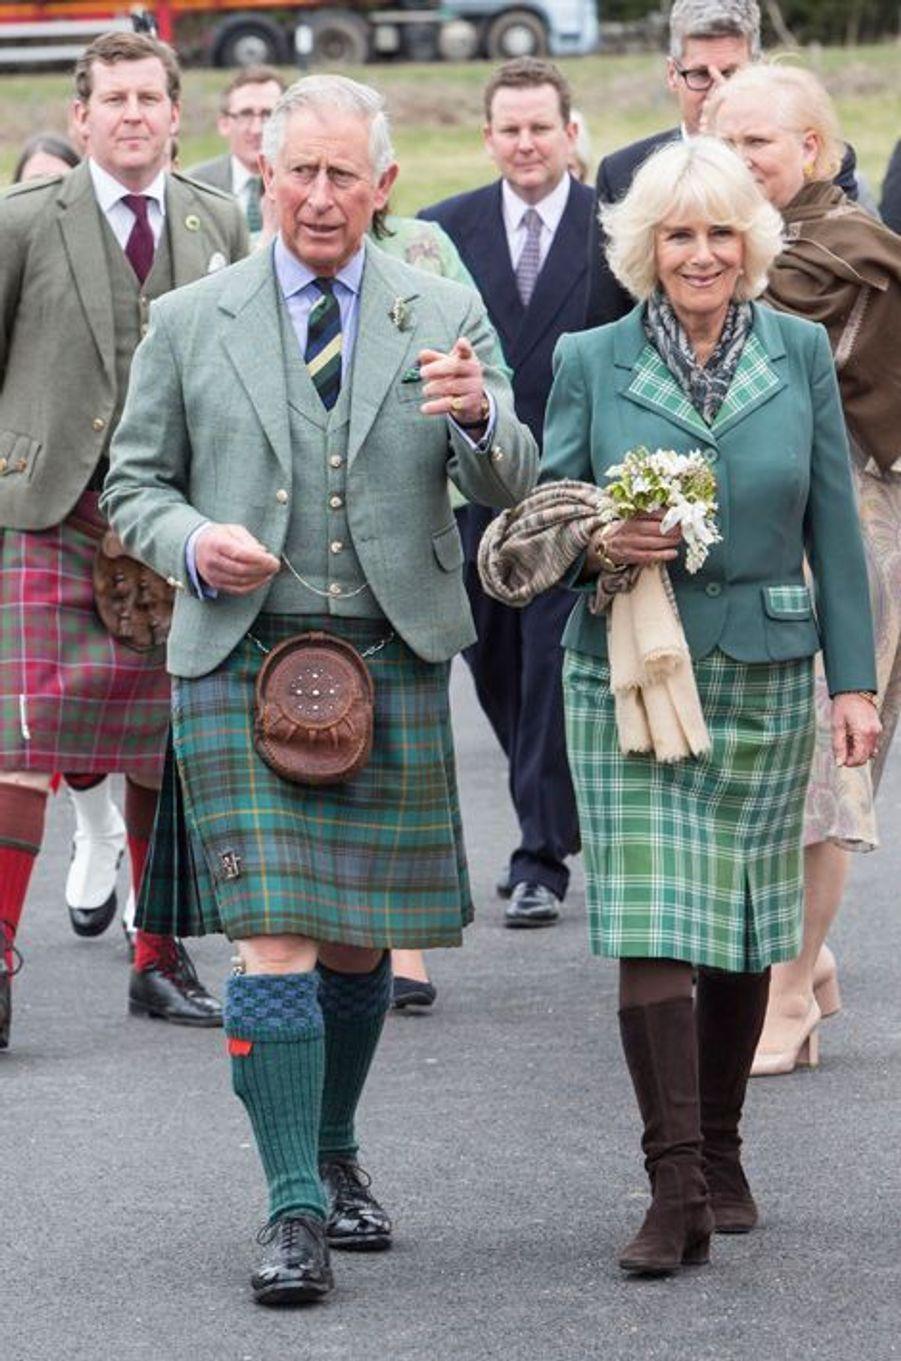 Le prince Charles et Camilla Parker Bowles inaugurent la Ballindalloch Distillery, le 16 avril 2015